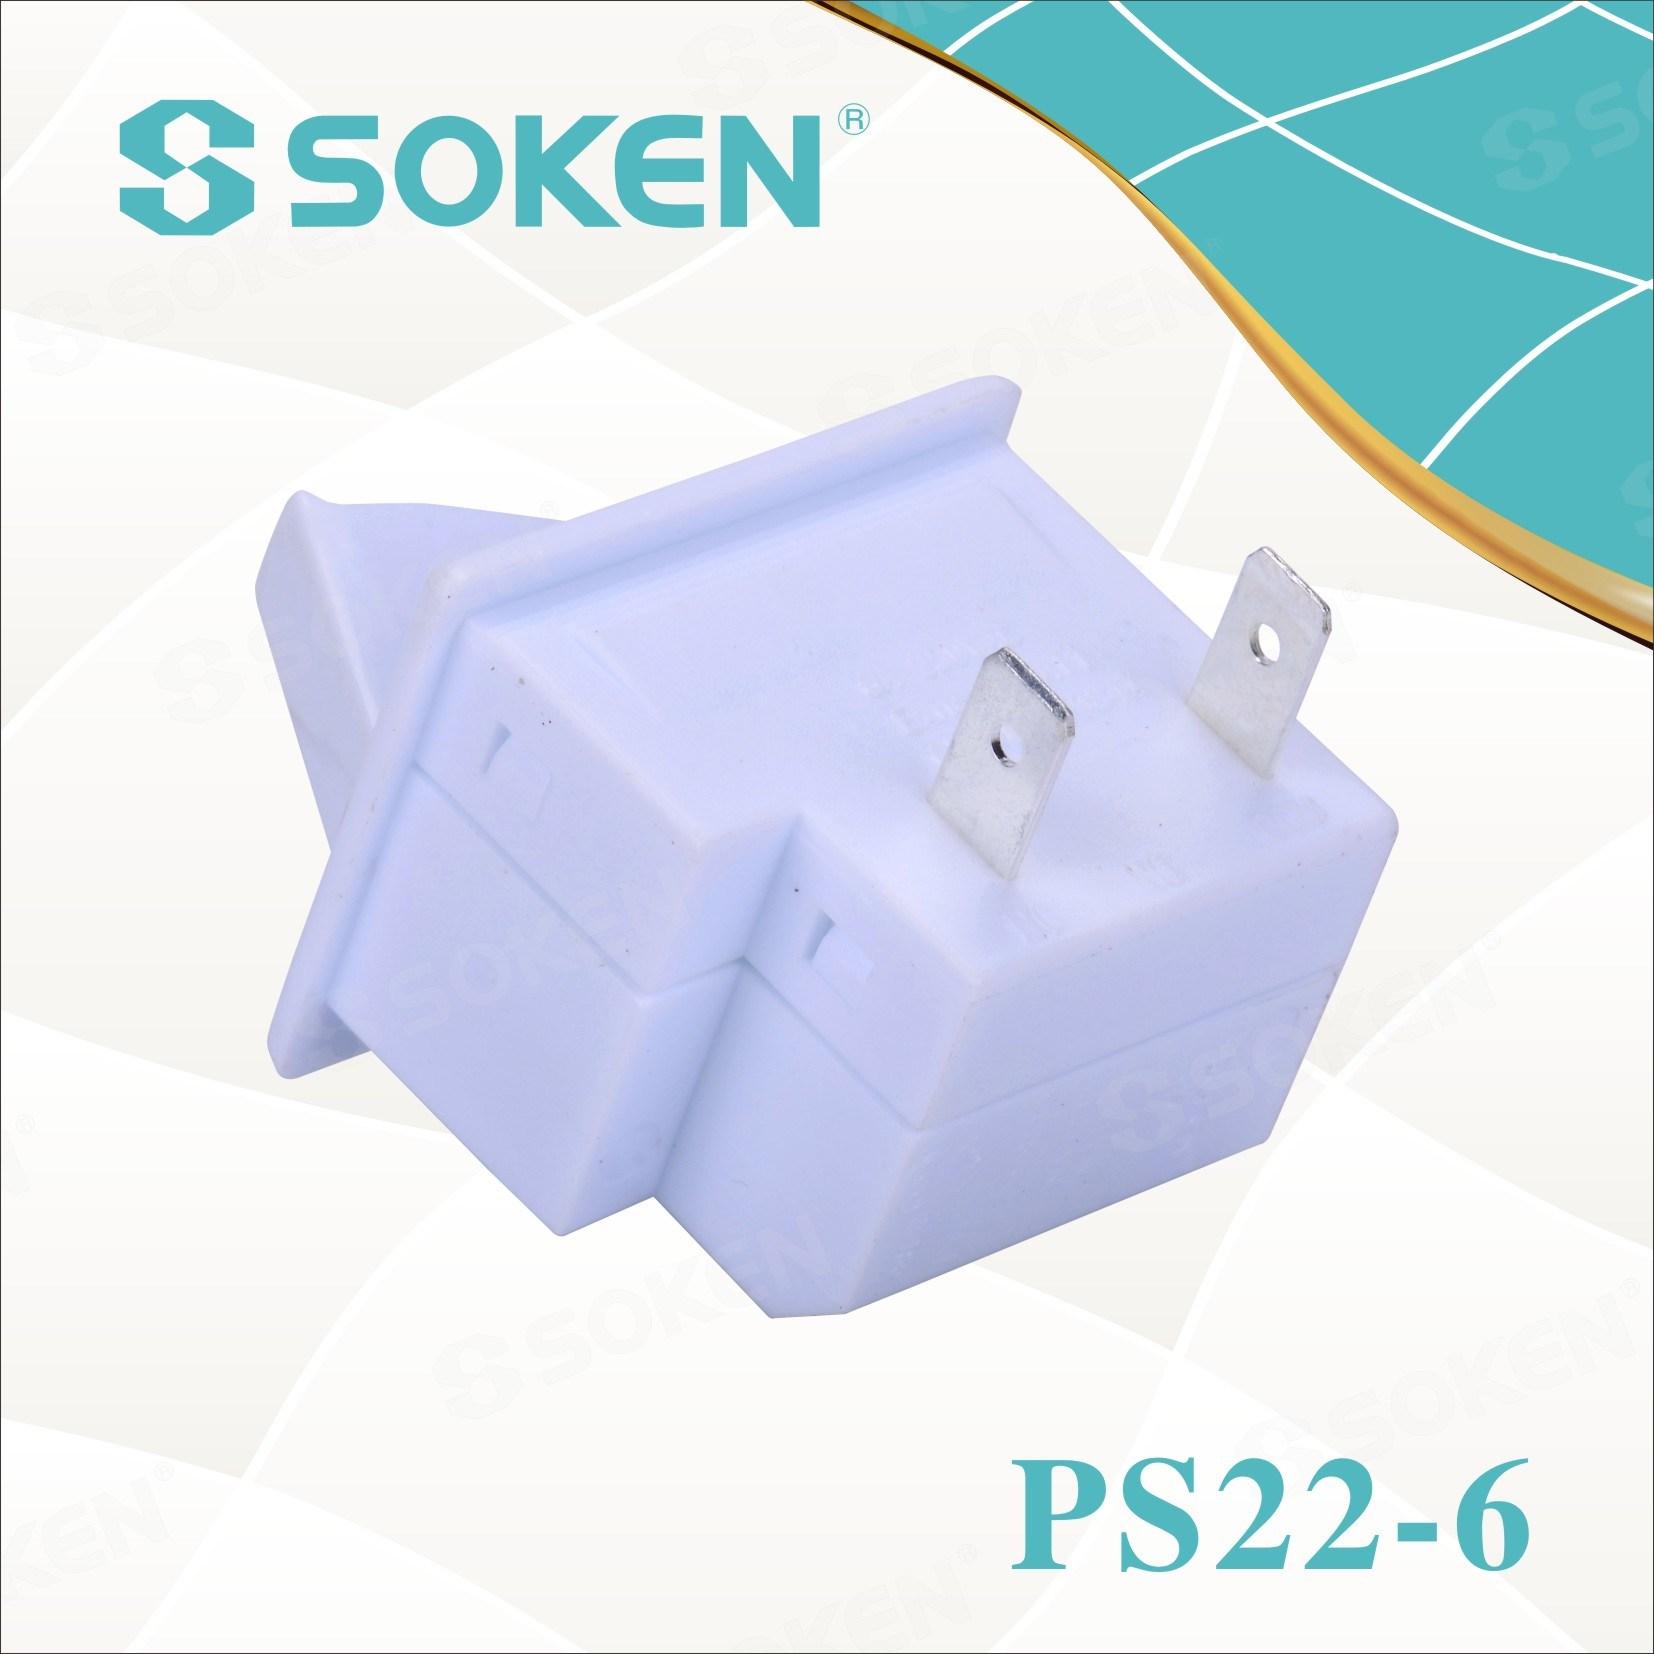 Soken Refrigerator Door Lamp Push Button Switch PS22-6